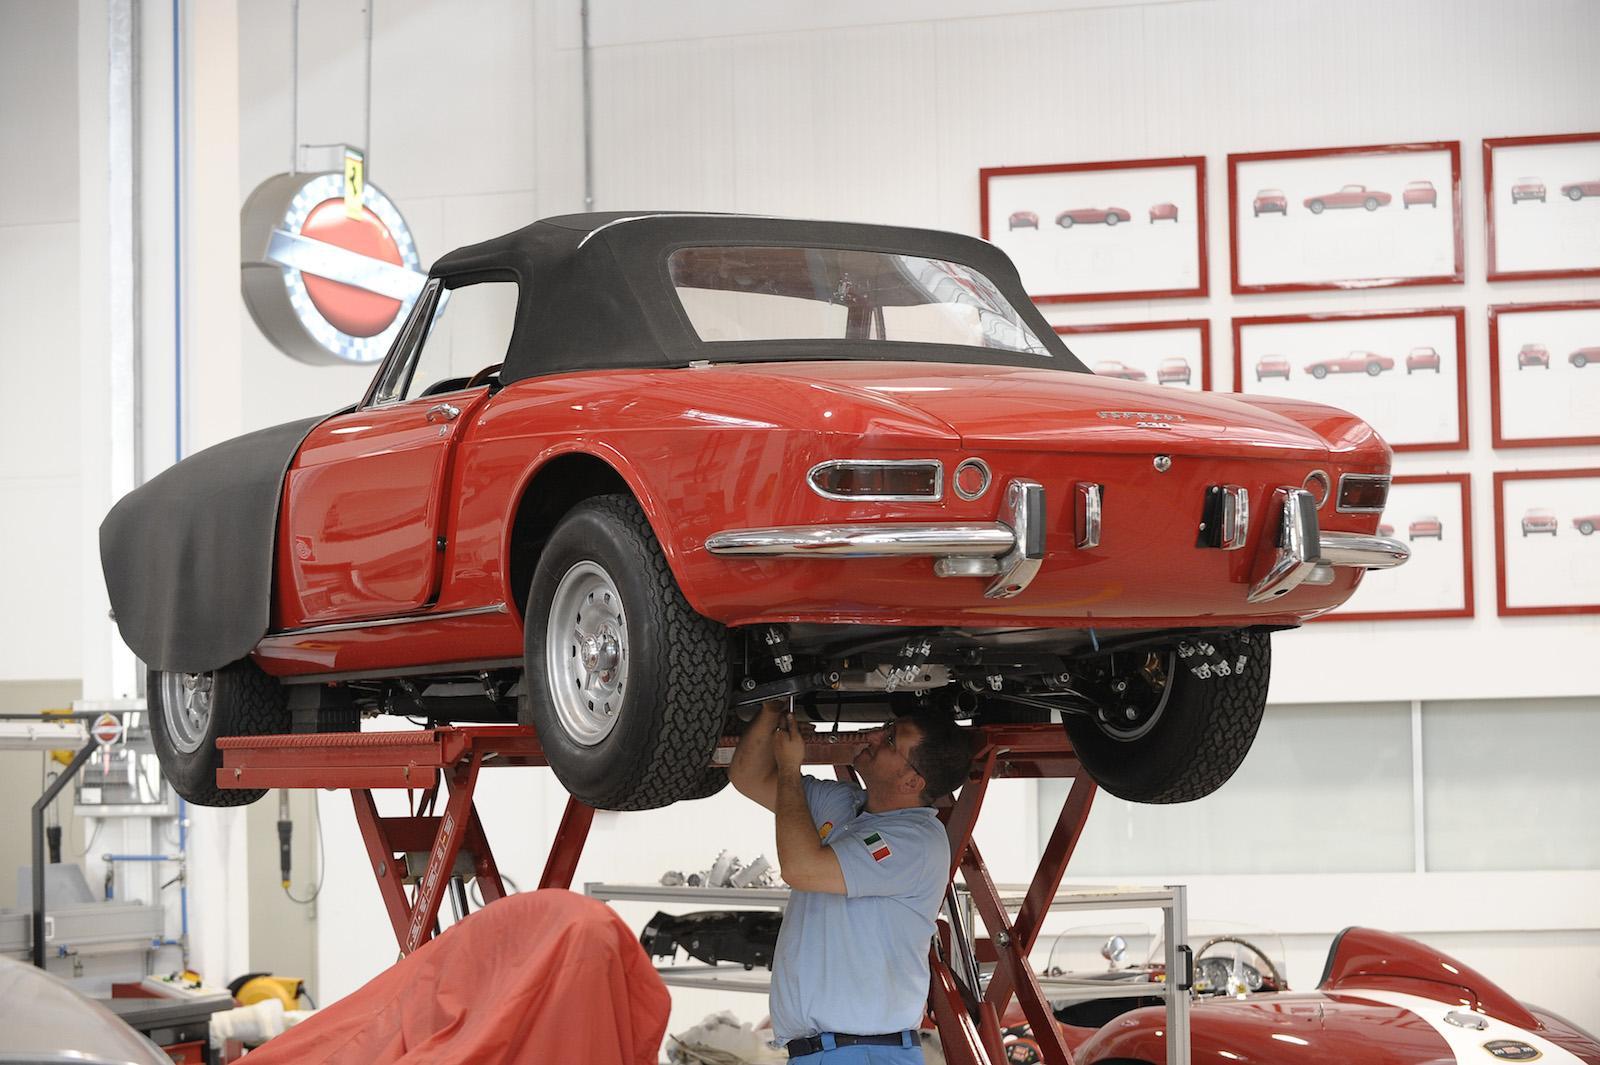 London's HR Owen receives Ferrari Classiche approval